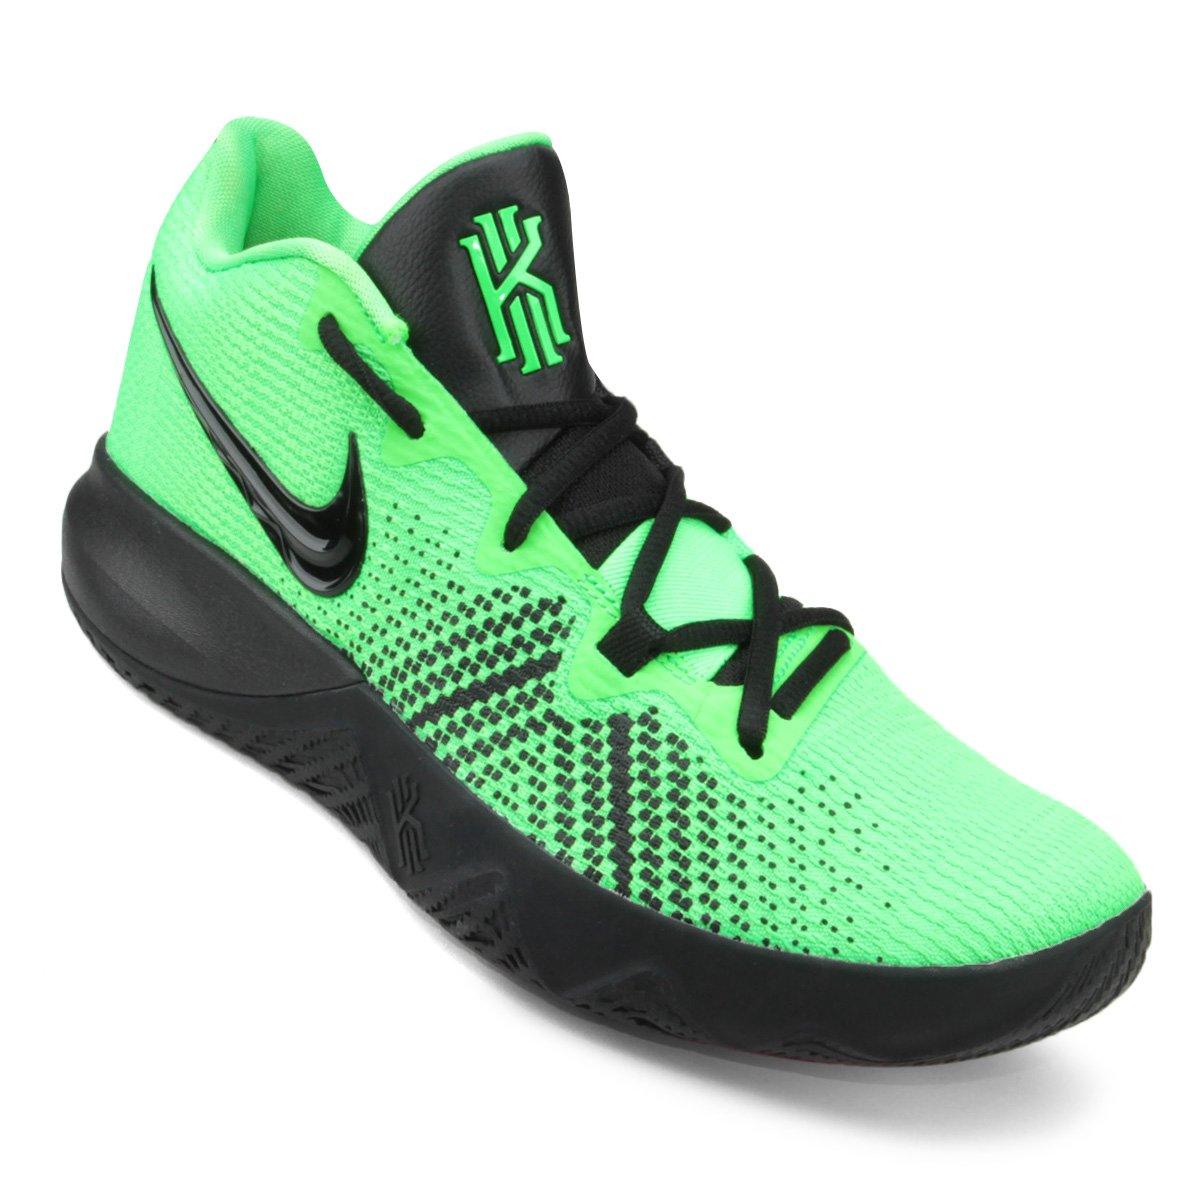 17c6b89b55 Tênis Nike Kyrie Flytrap Masculino - Verde e Preto - Compre Agora ...